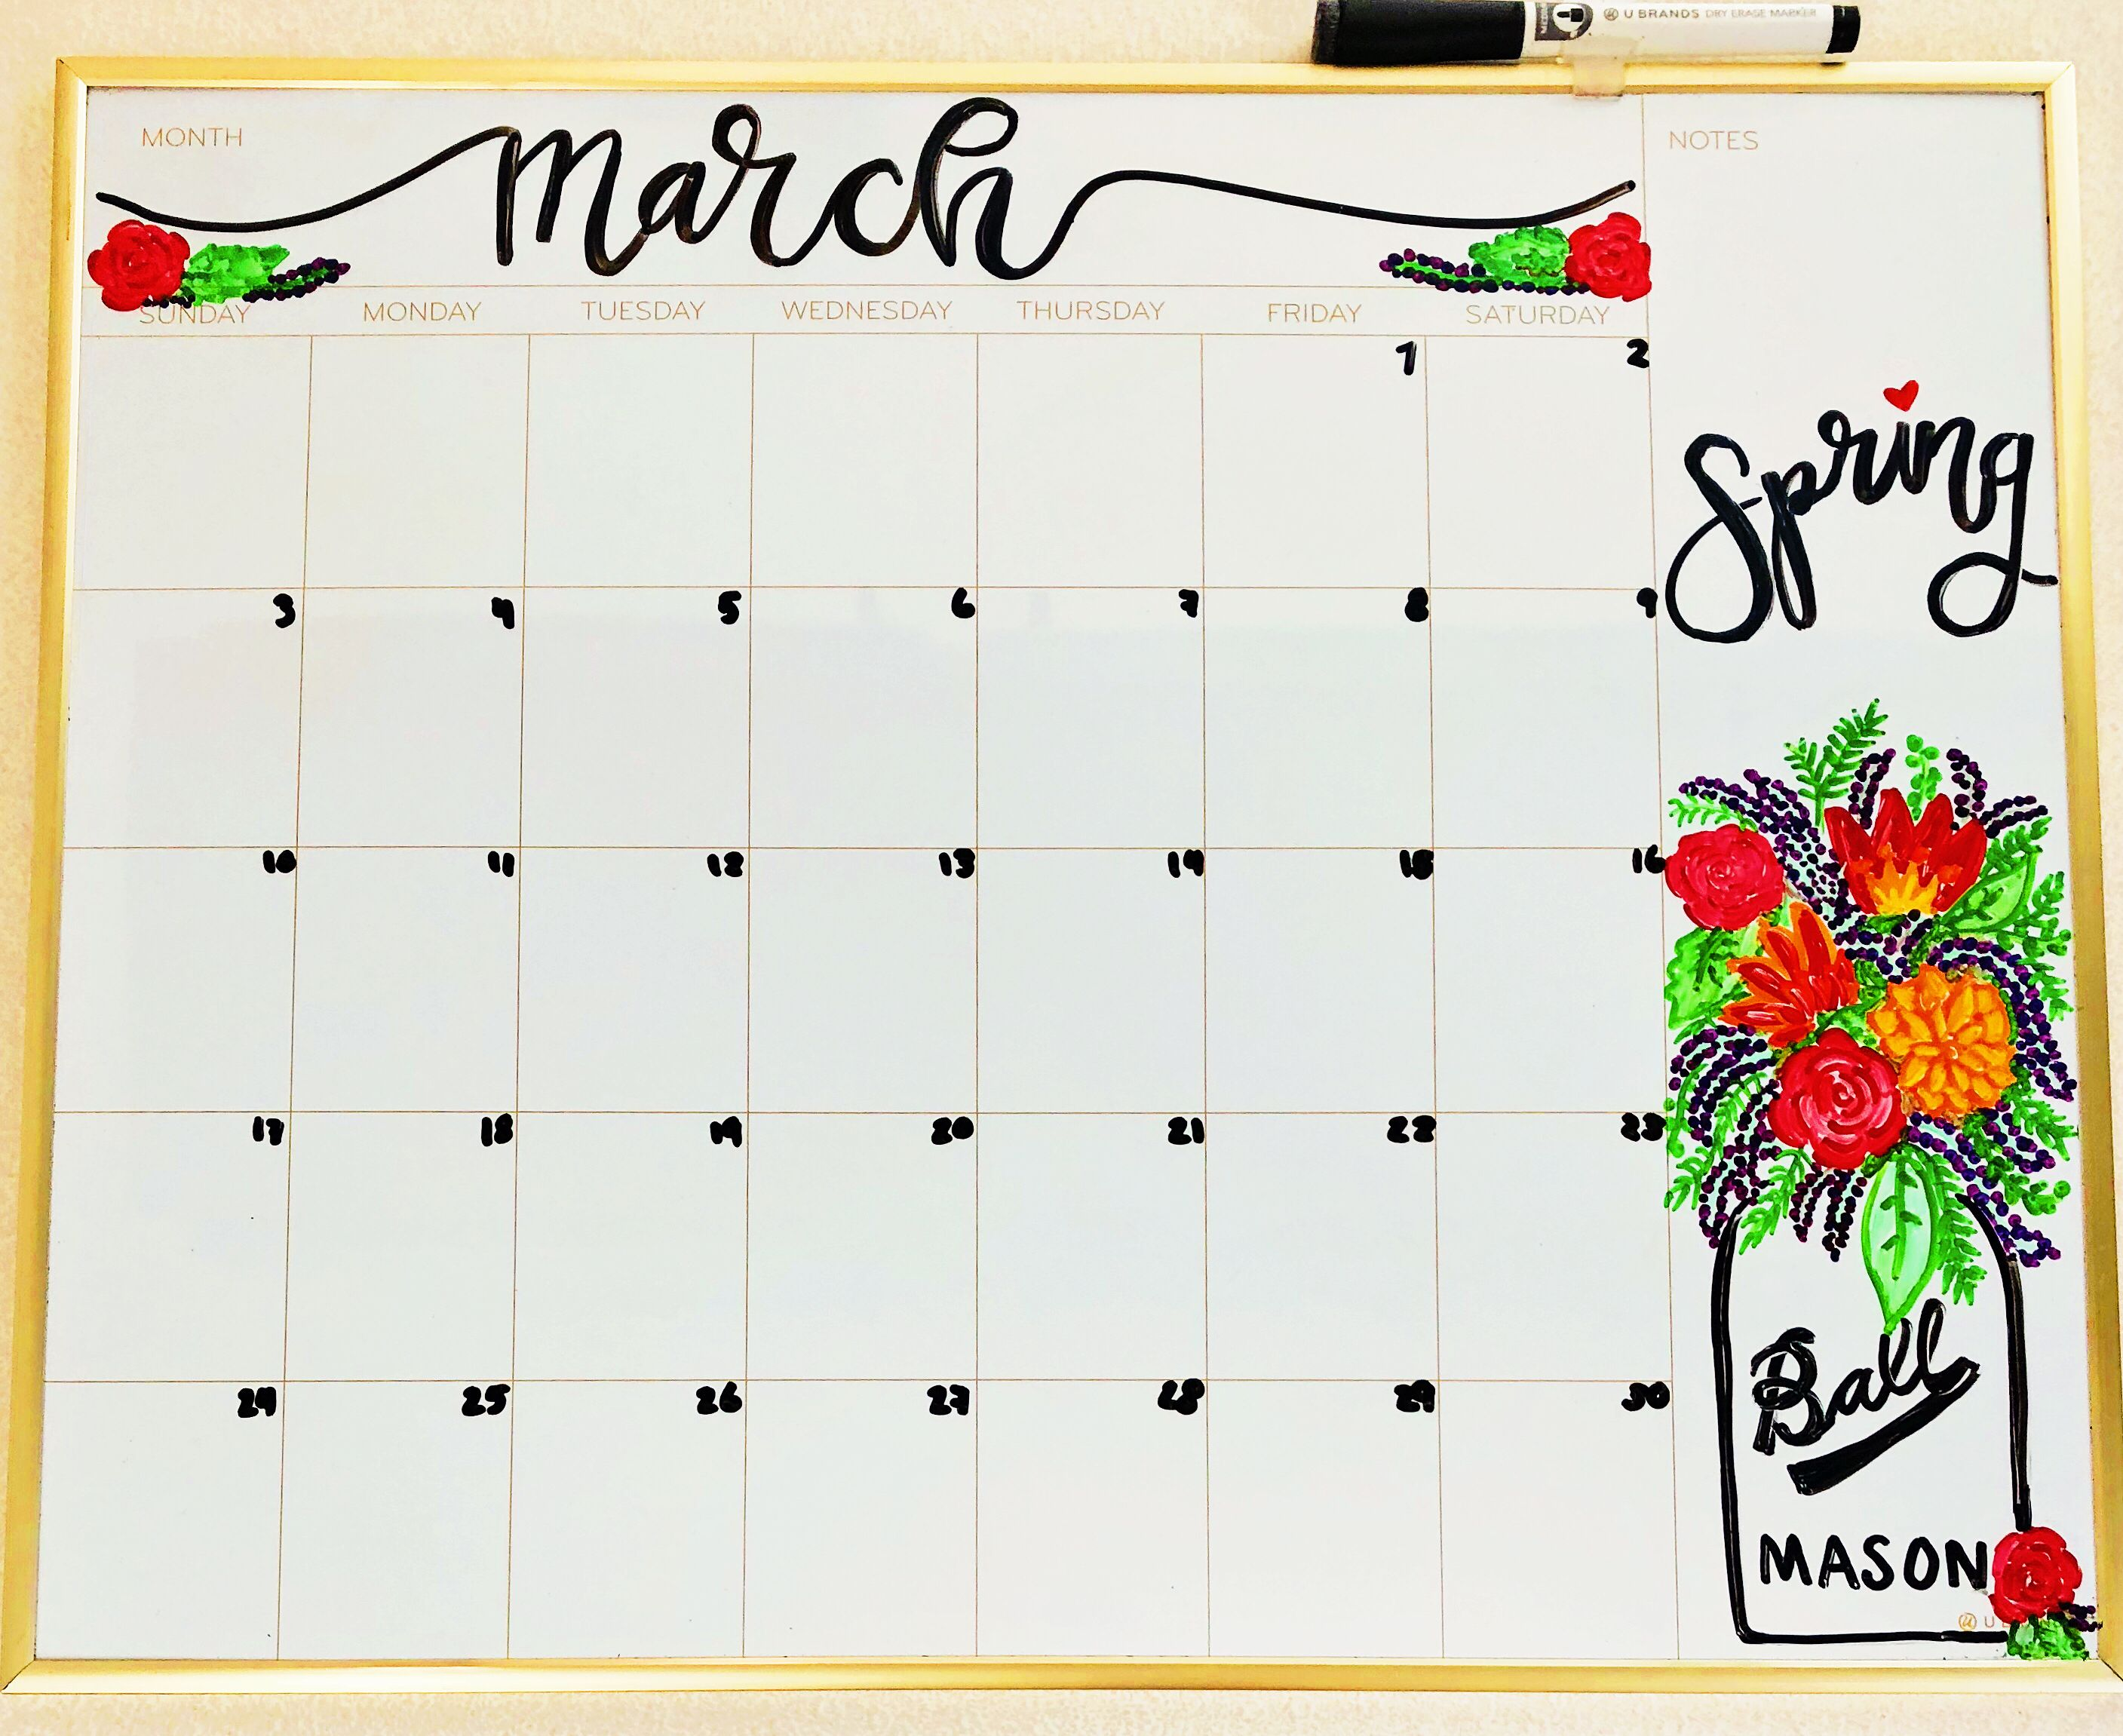 March Whiteboard Calendar Spring Calendar Spring Whiteboard